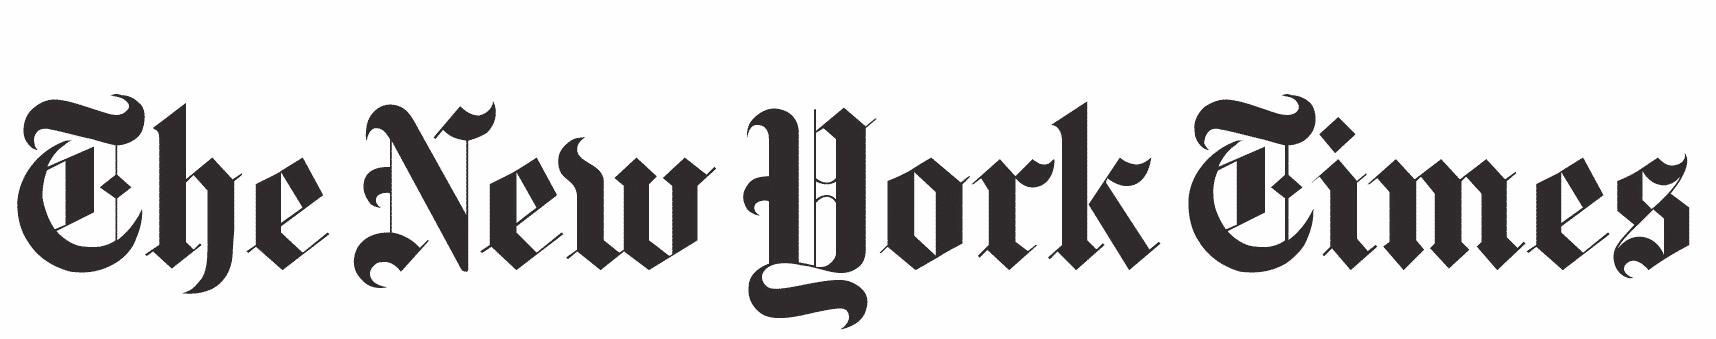 New Yorks Times logo